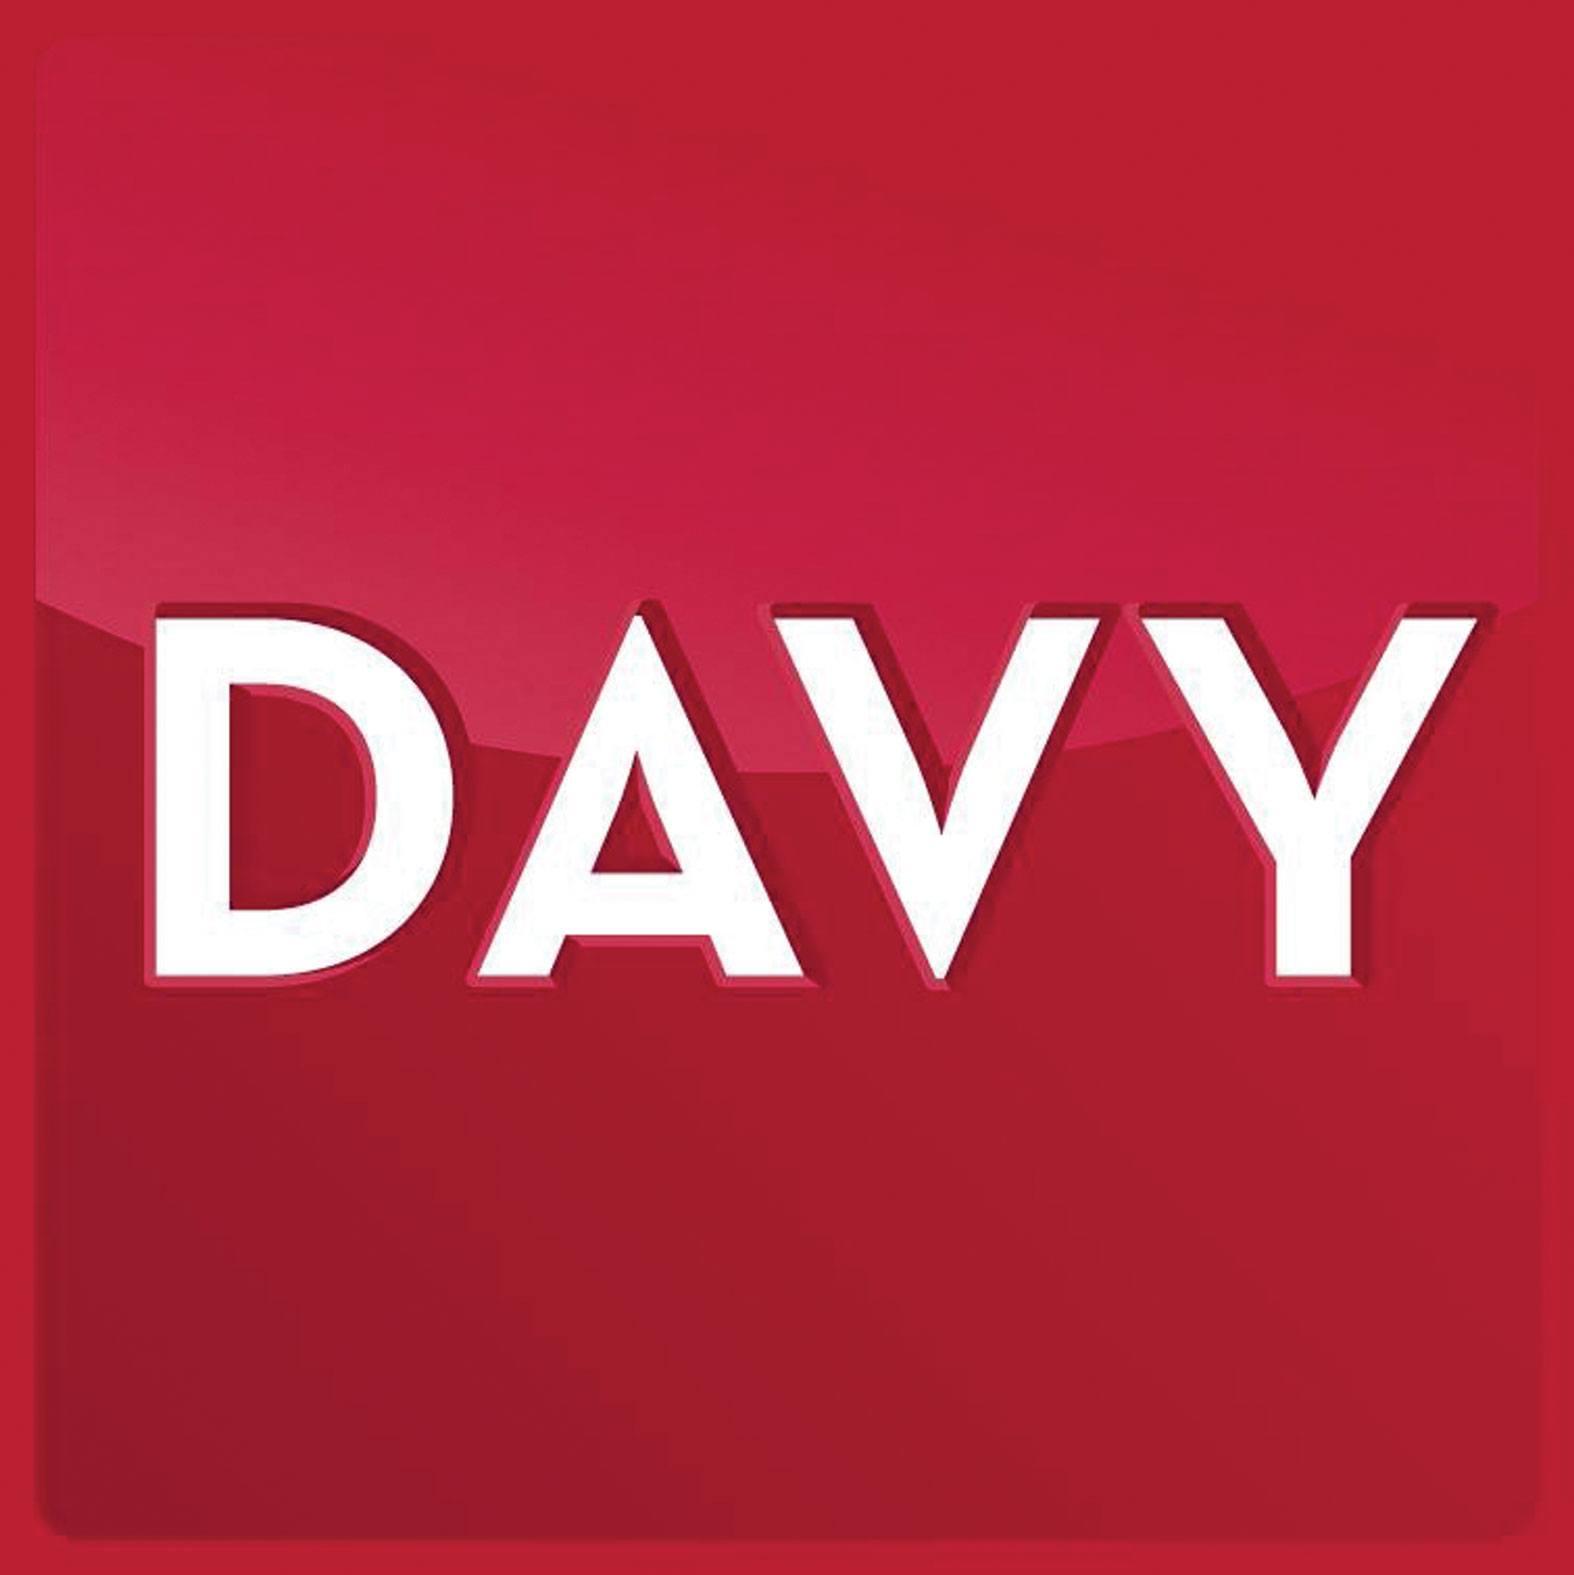 Davy Group logo